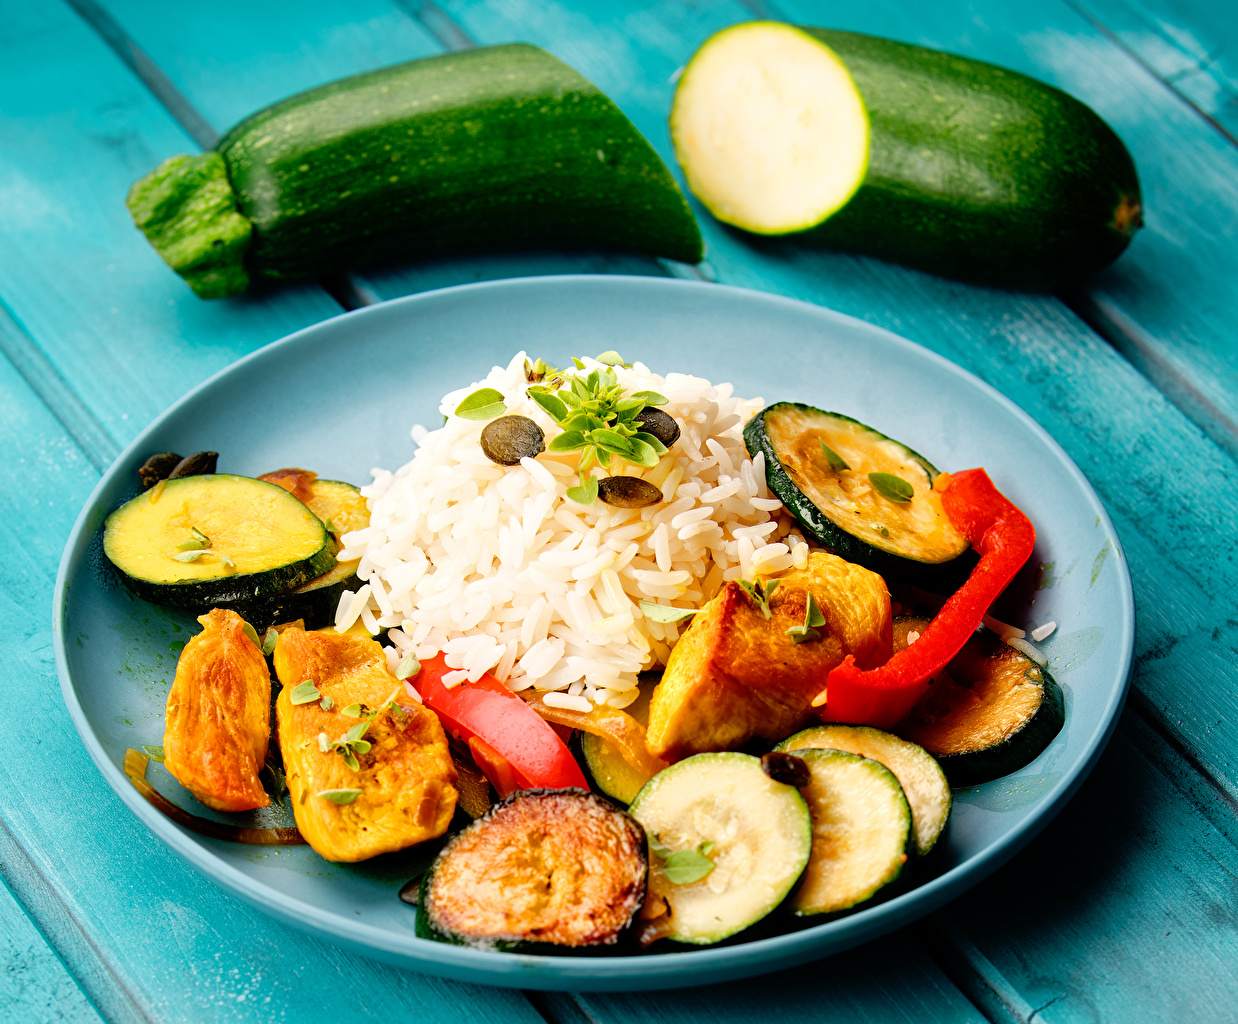 Картинки Рис Кабачок Пища Овощи тарелке Вторые блюда кабачки Еда Тарелка Продукты питания